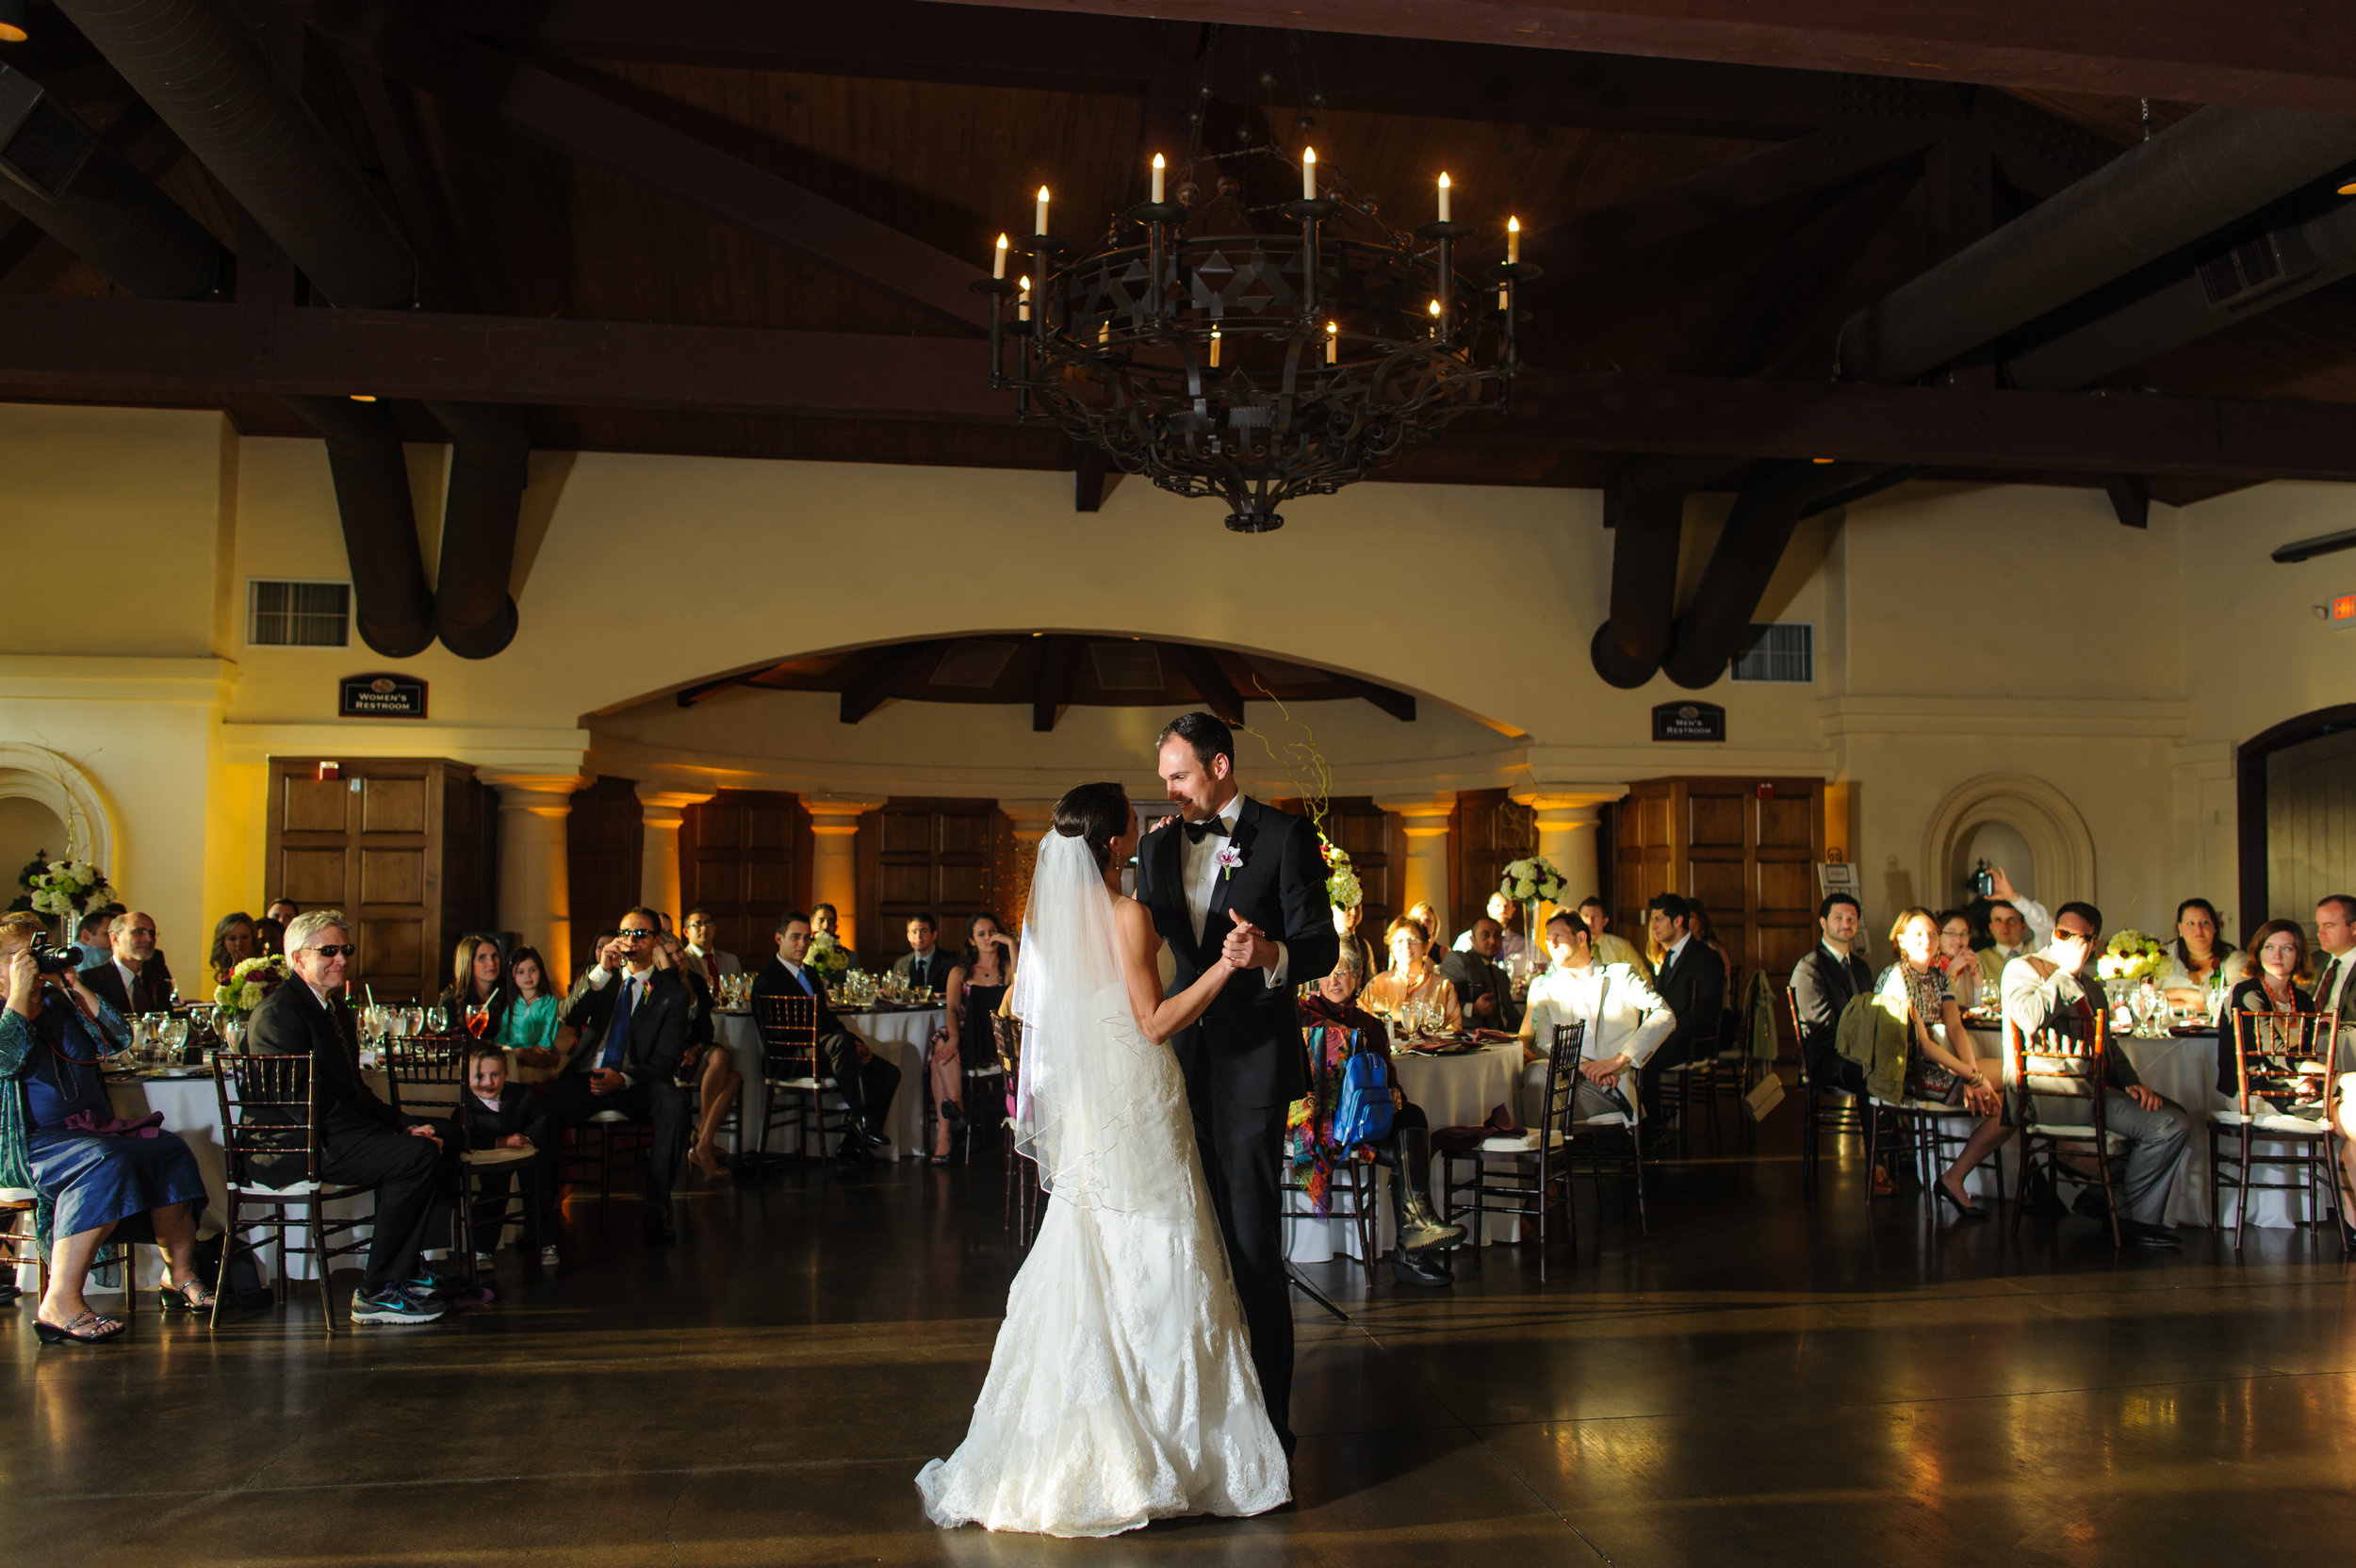 lindsey-jake-026-the-bridges-golf-course-san-ramon-wedding-photographer-katherine-nicole-photography.JPG